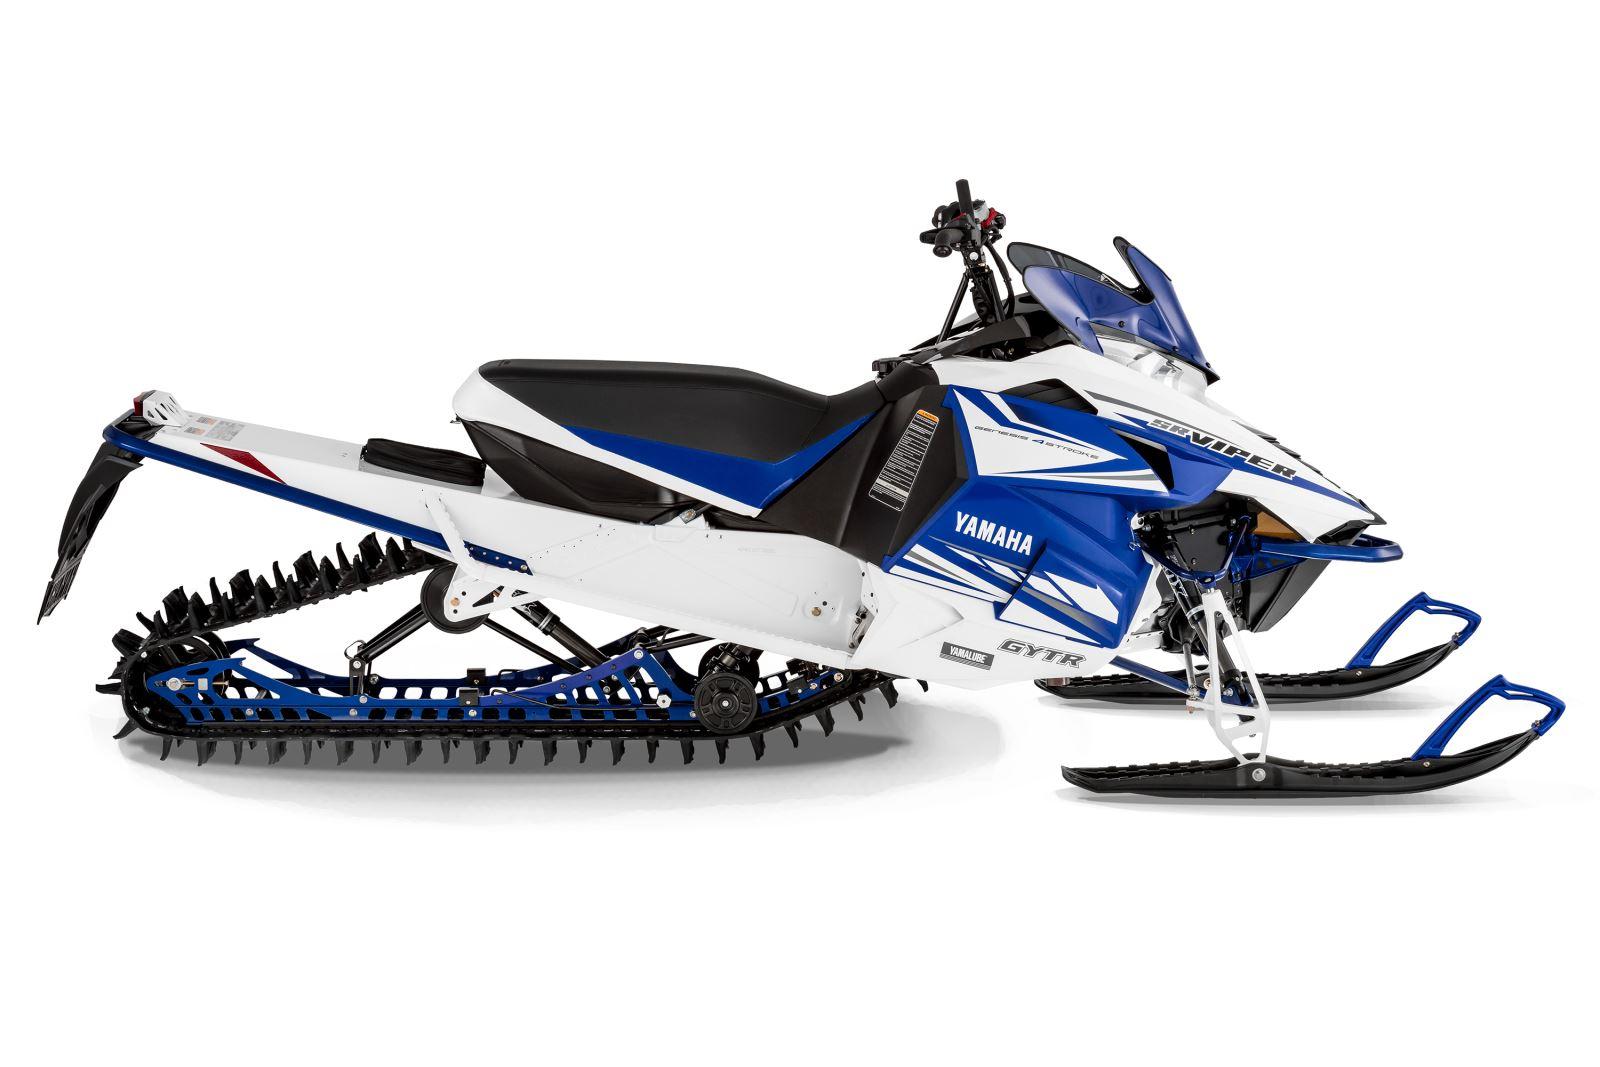 2016 yamaha snowmobile news autos post for Yamaha snowmobiles canada